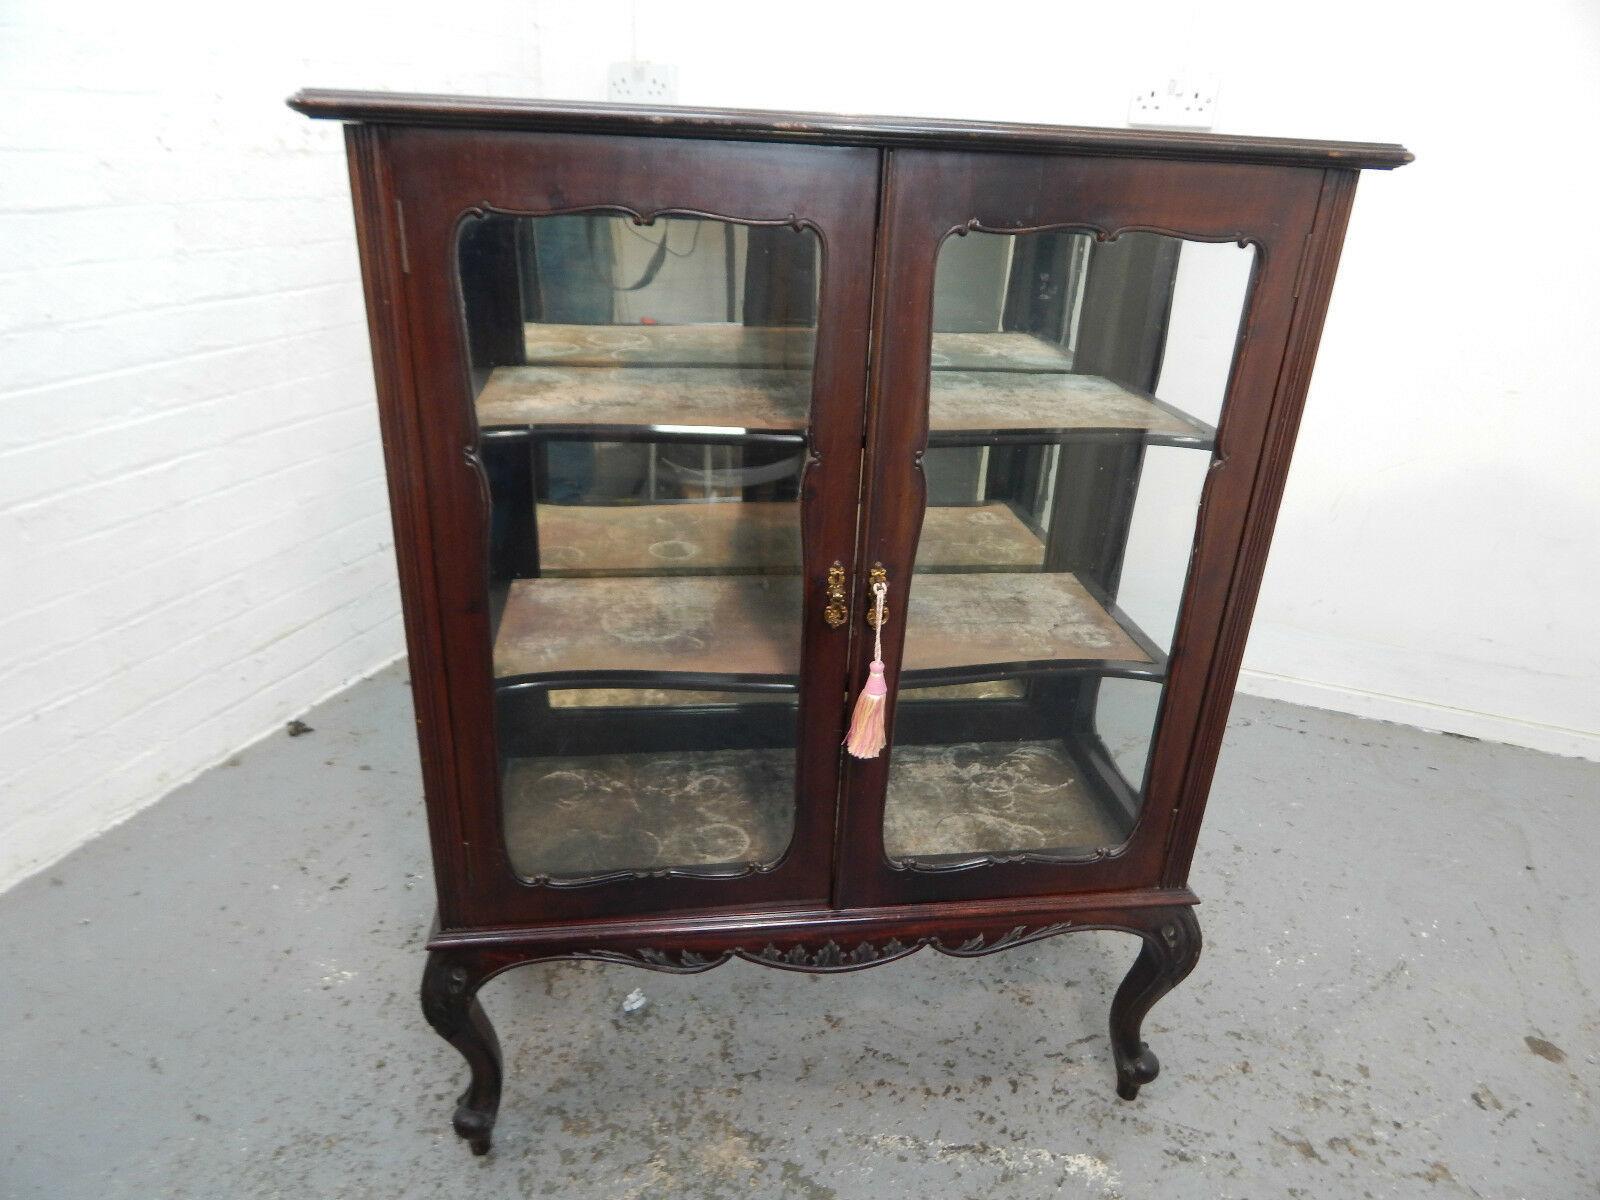 Antique Victorian Mahogany Bookcase Cabinet Glazed Doors Cabriole Legs Shelves